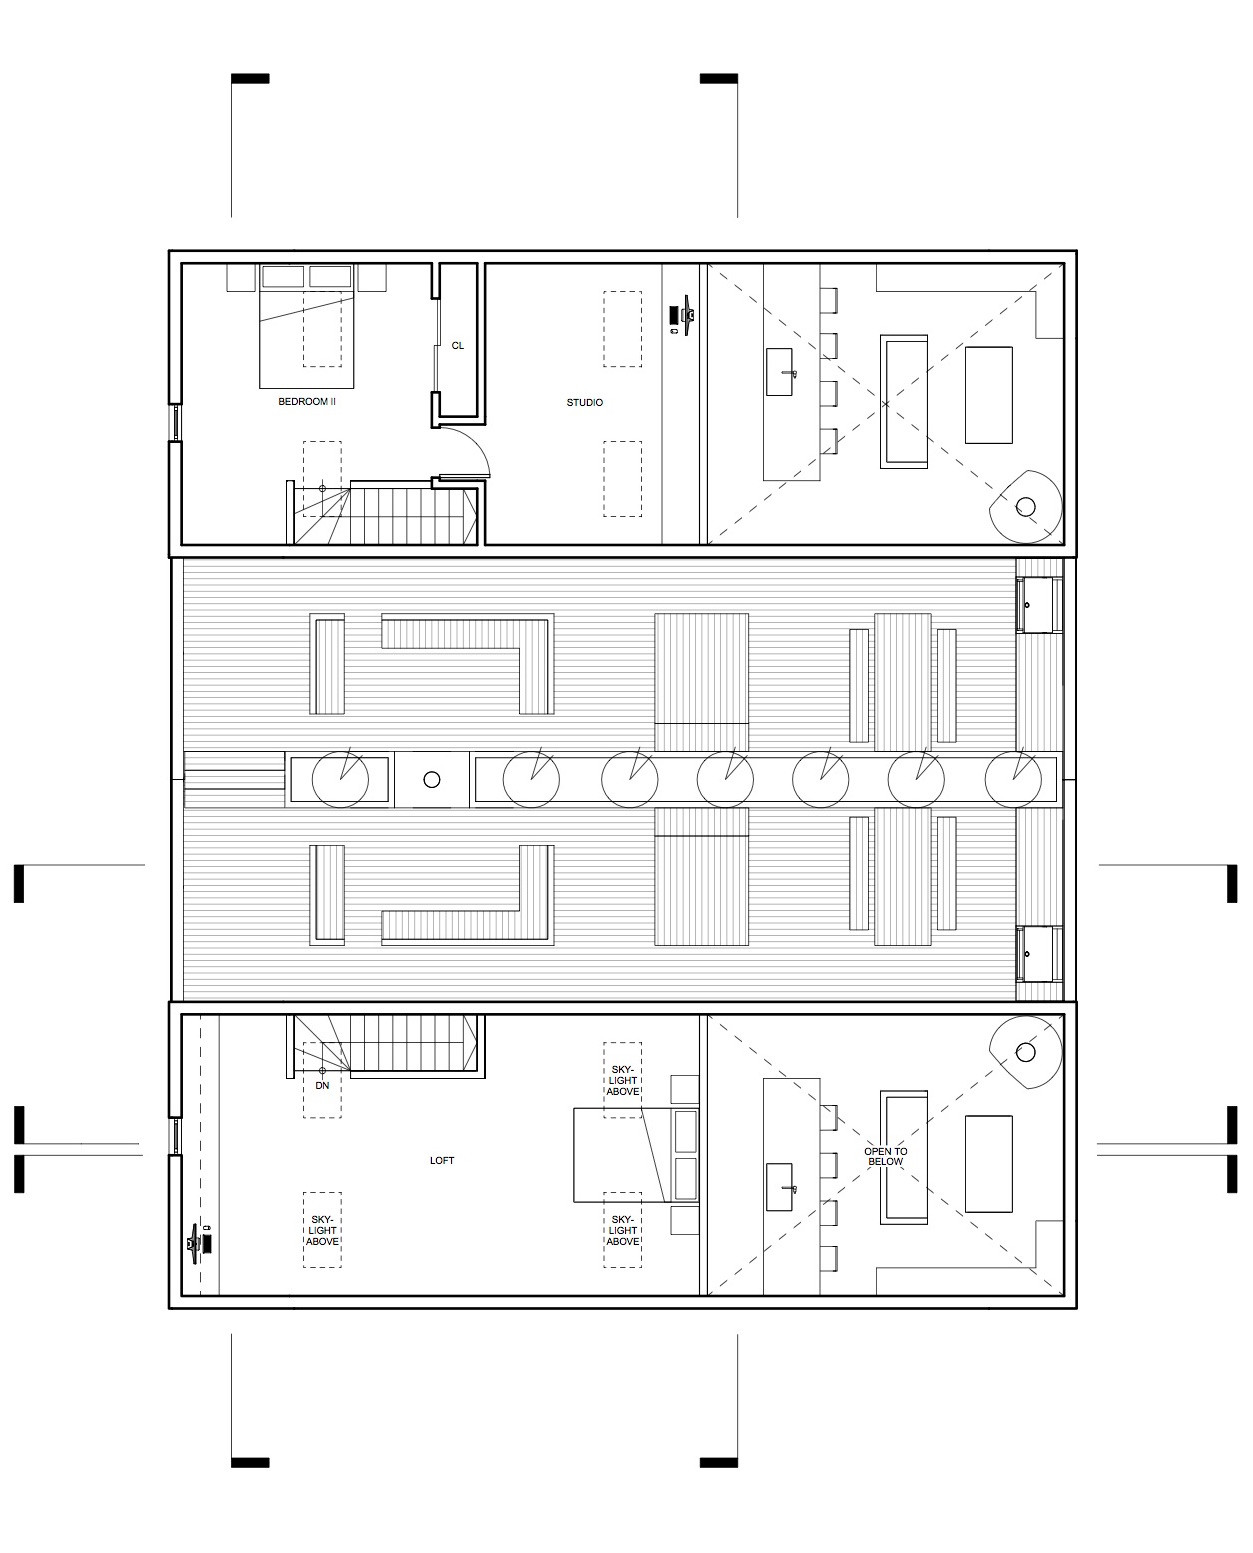 A202 - SECOND LEVEL PLAN.jpg